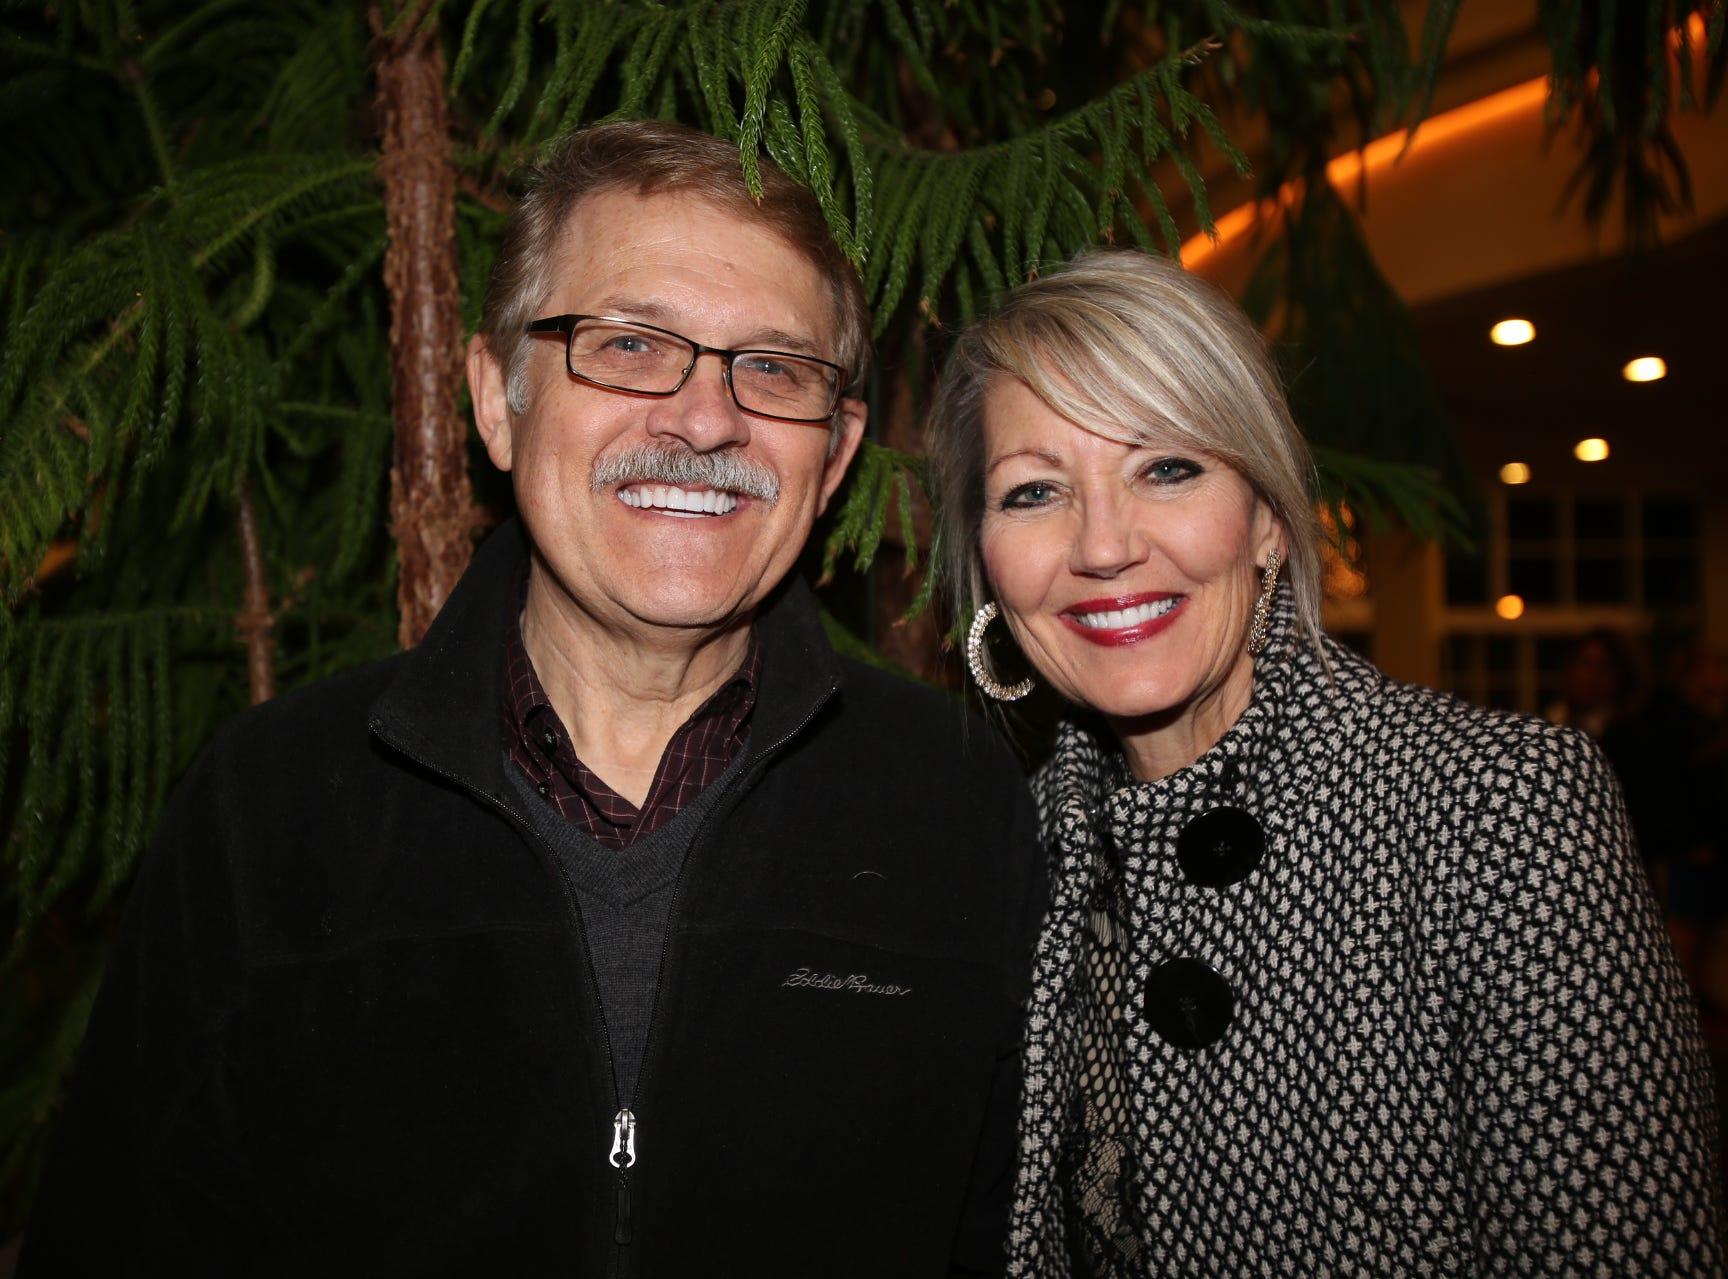 RC and Karen Amer